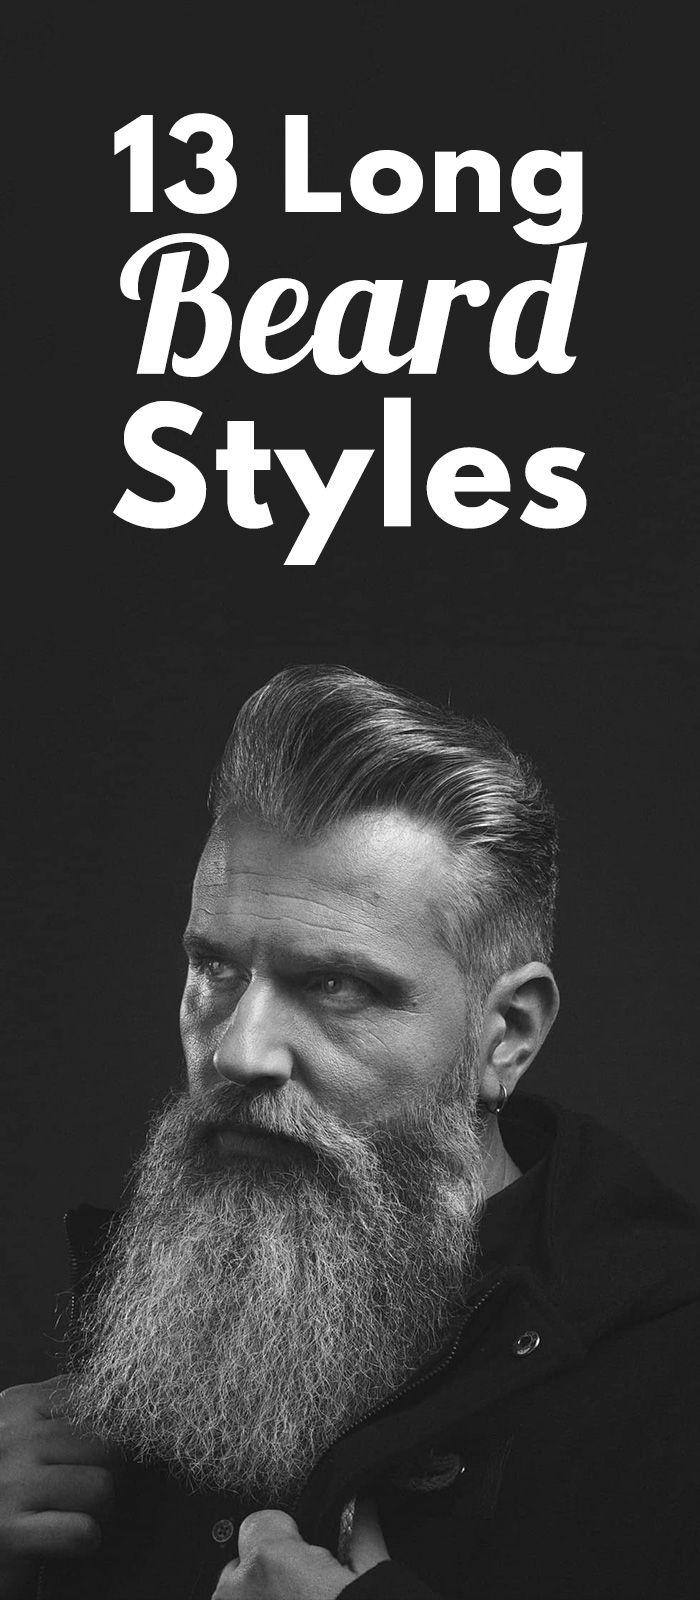 Ultimate Long Beard Guide #hairandbeardstyles